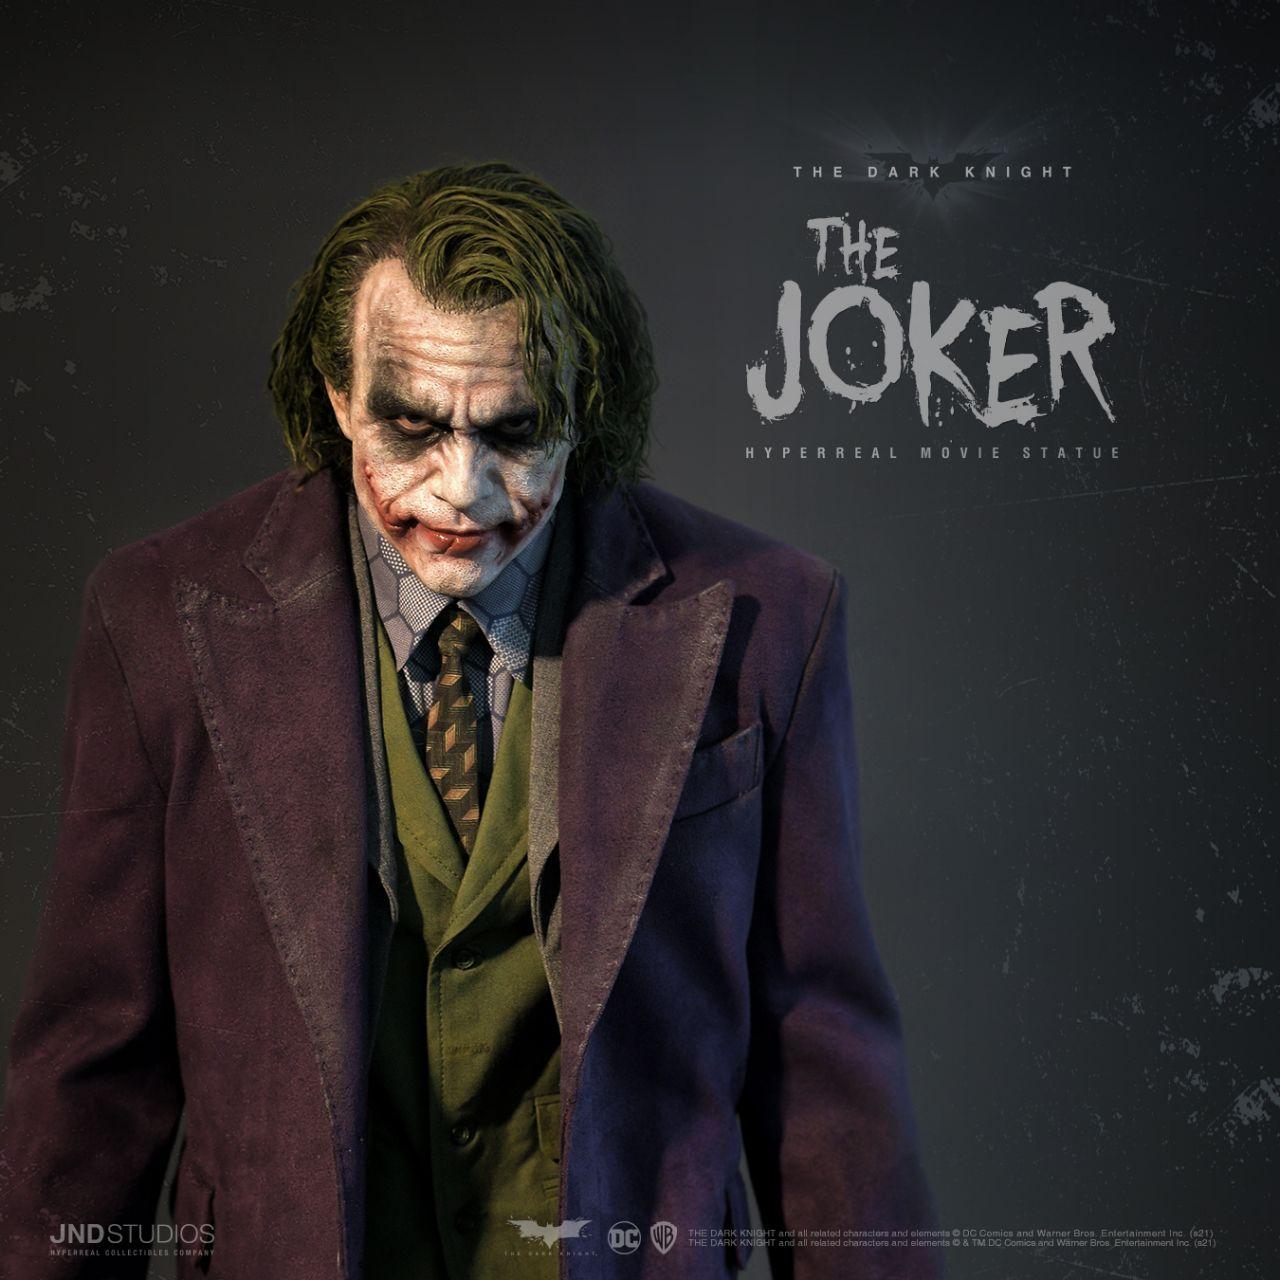 JND Studios - The Joker (Heath Ledger) - Hyperreal Movie Statue - The Dark Knight